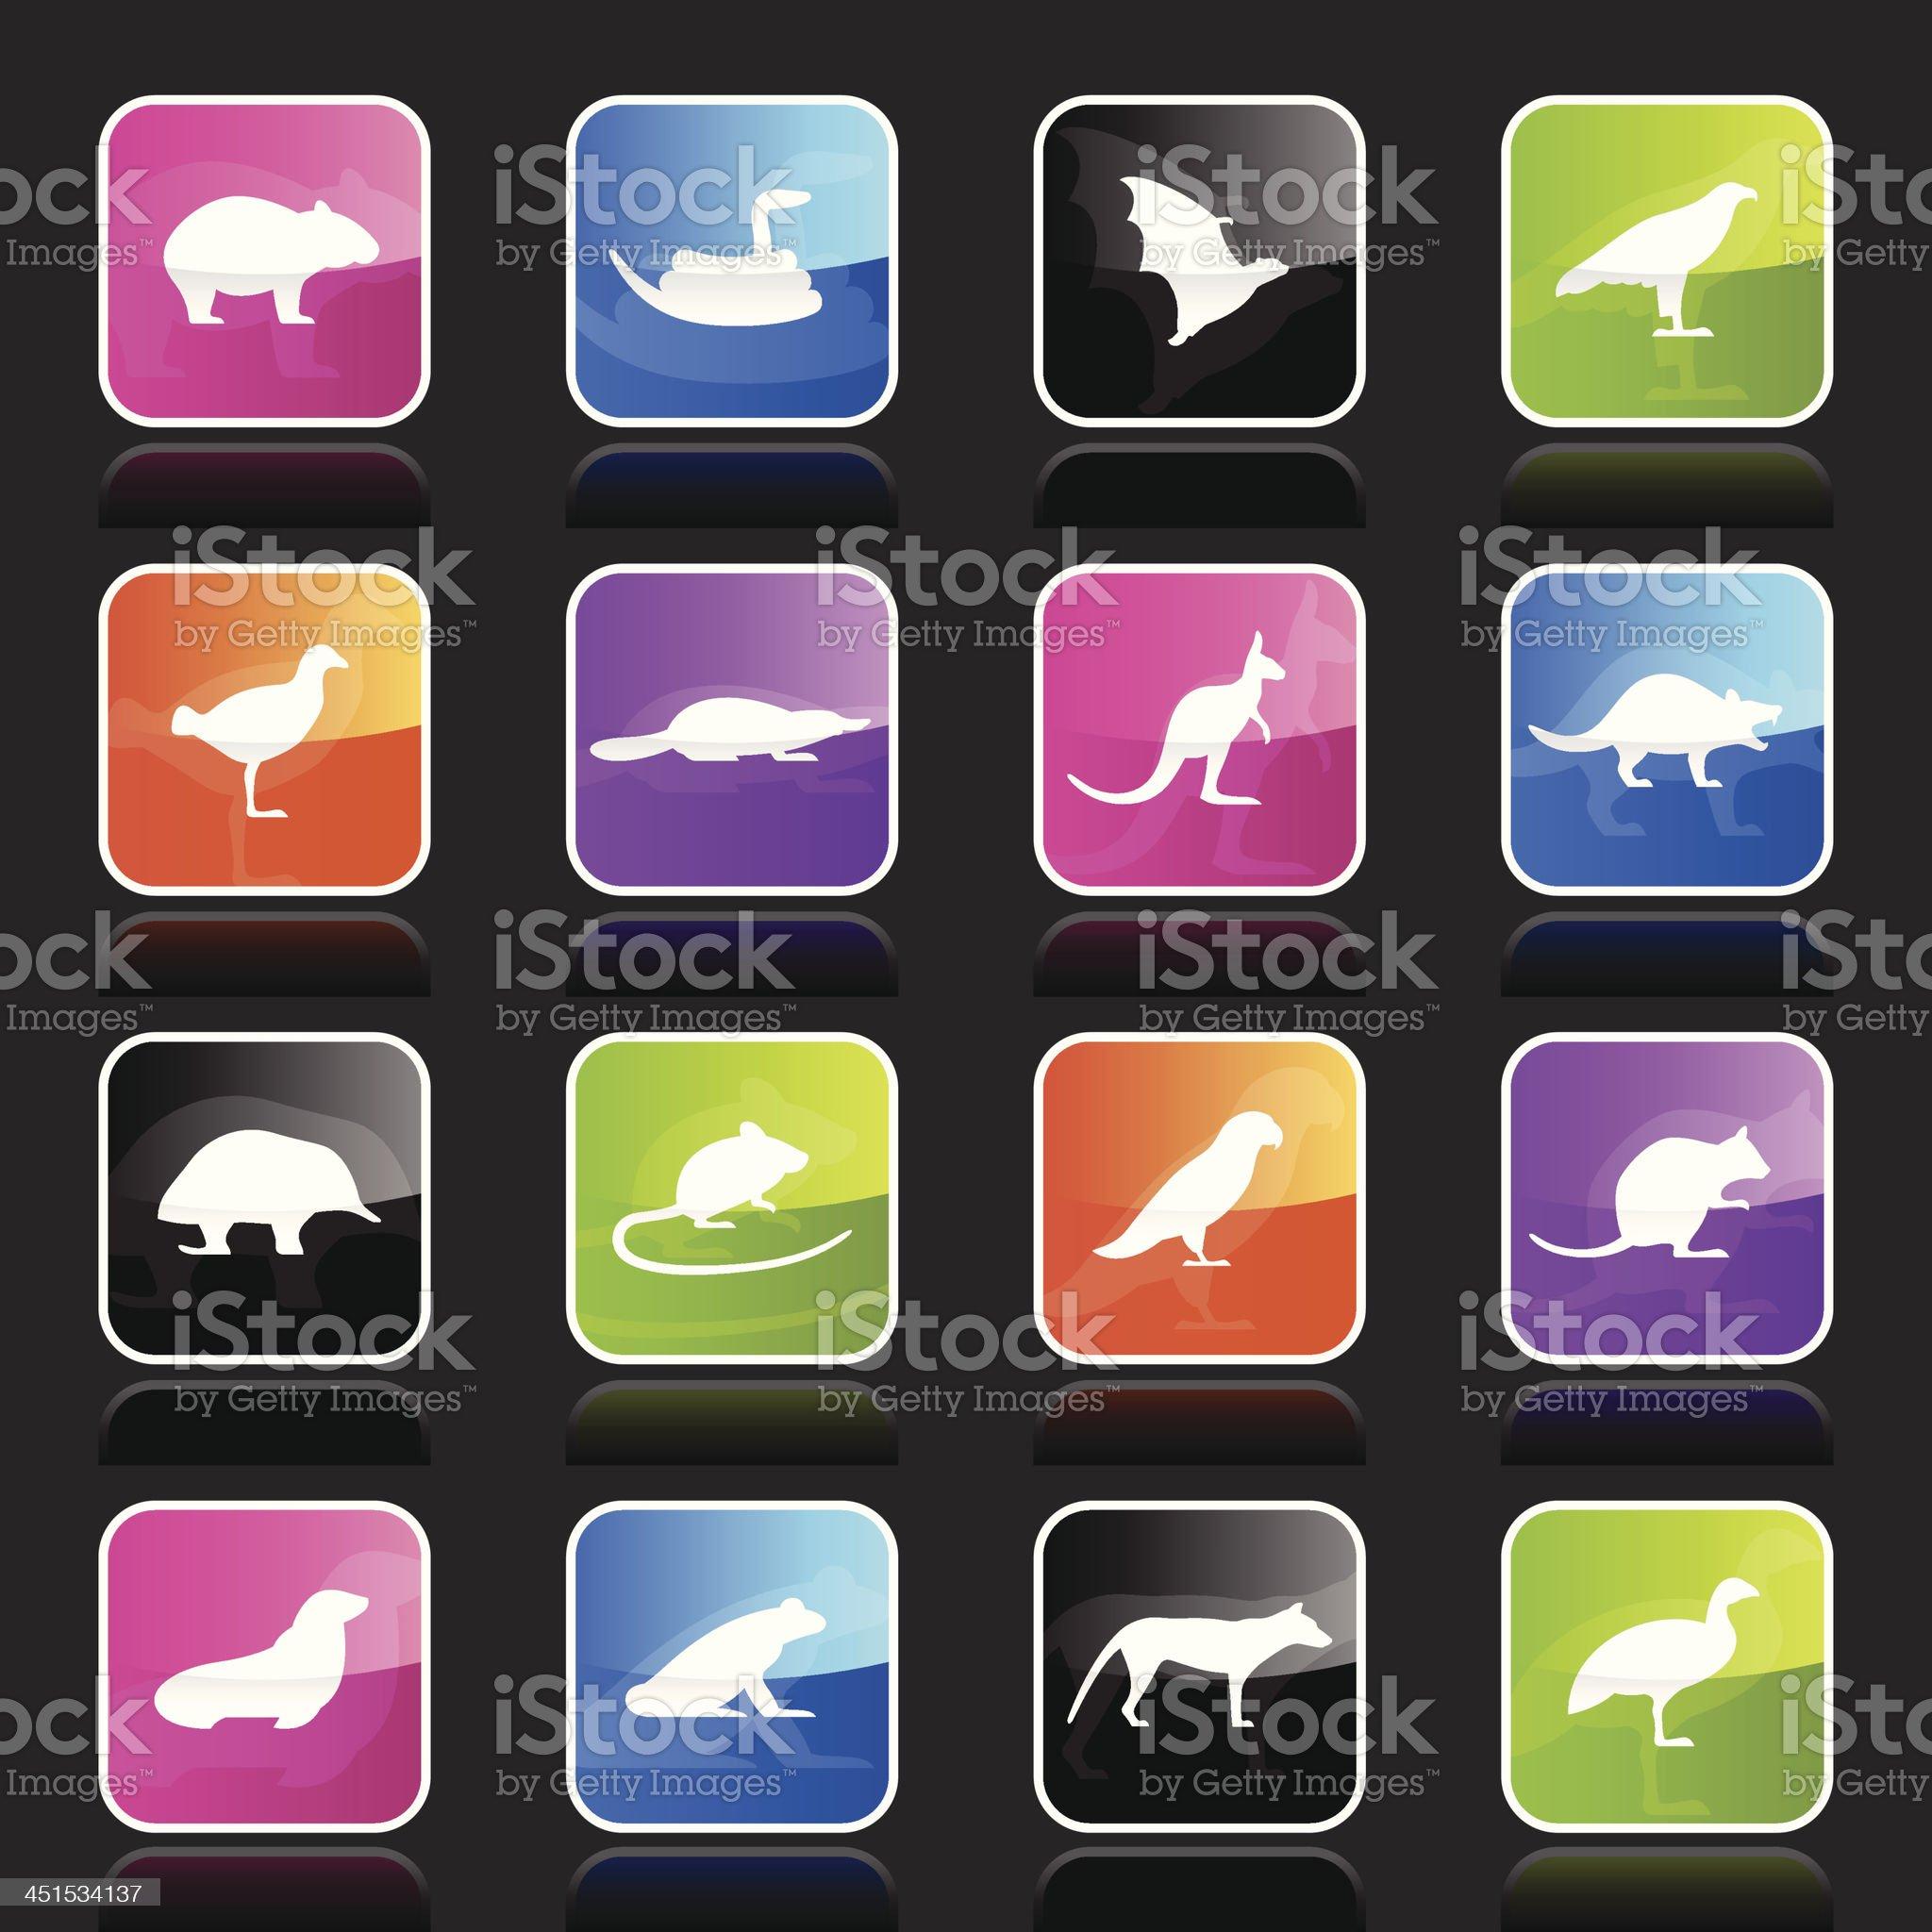 Ubergloss Icons - Tasmanian Animals royalty-free stock vector art